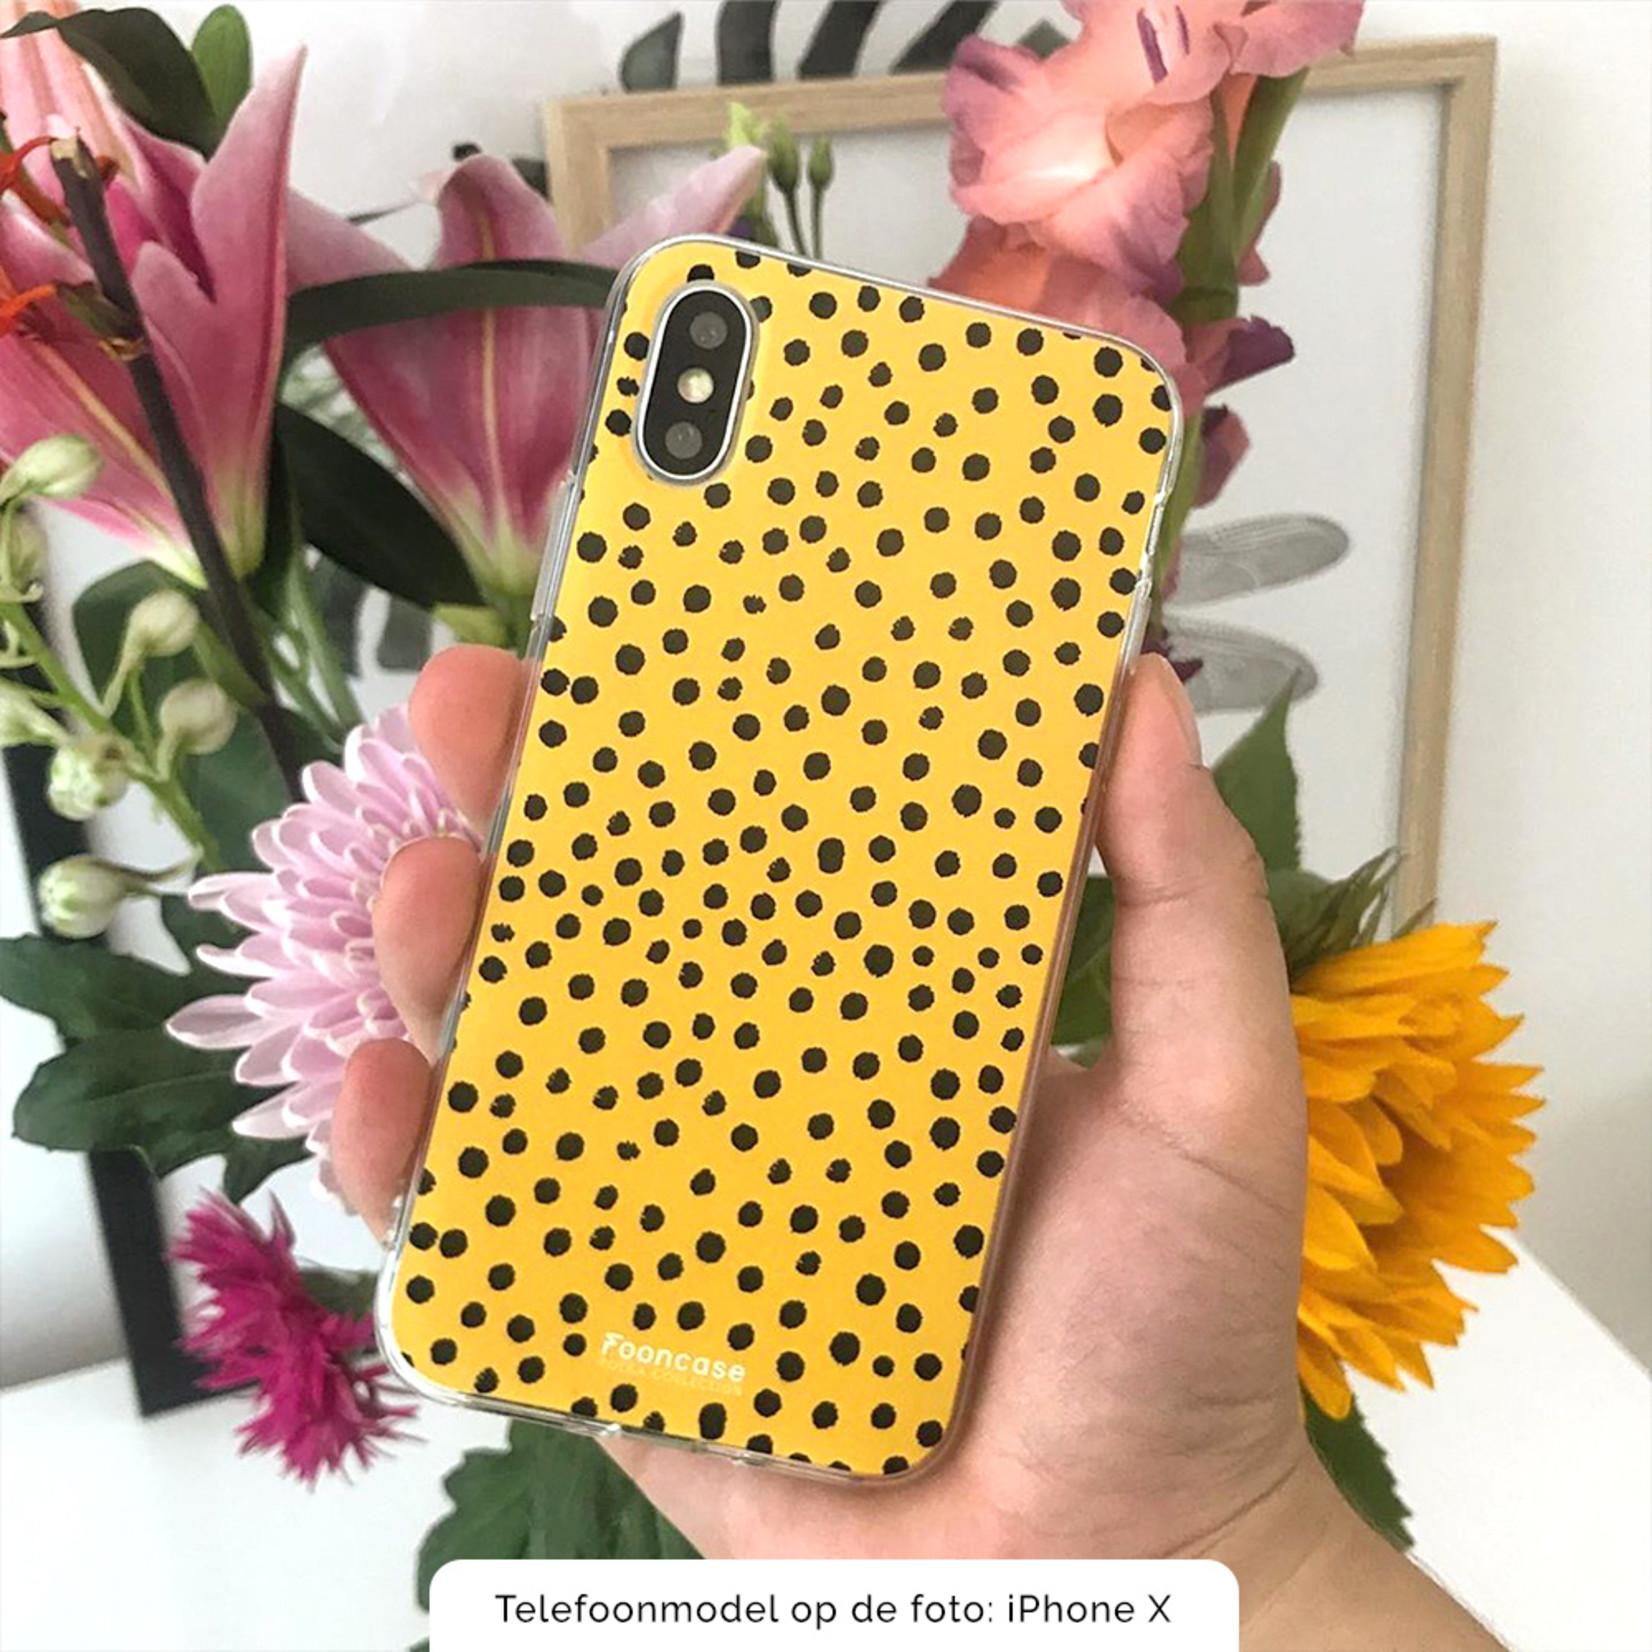 FOONCASE Huawei P10 Lite hoesje TPU Soft Case - Back Cover - POLKA COLLECTION / Stipjes / Stippen / Okergeel